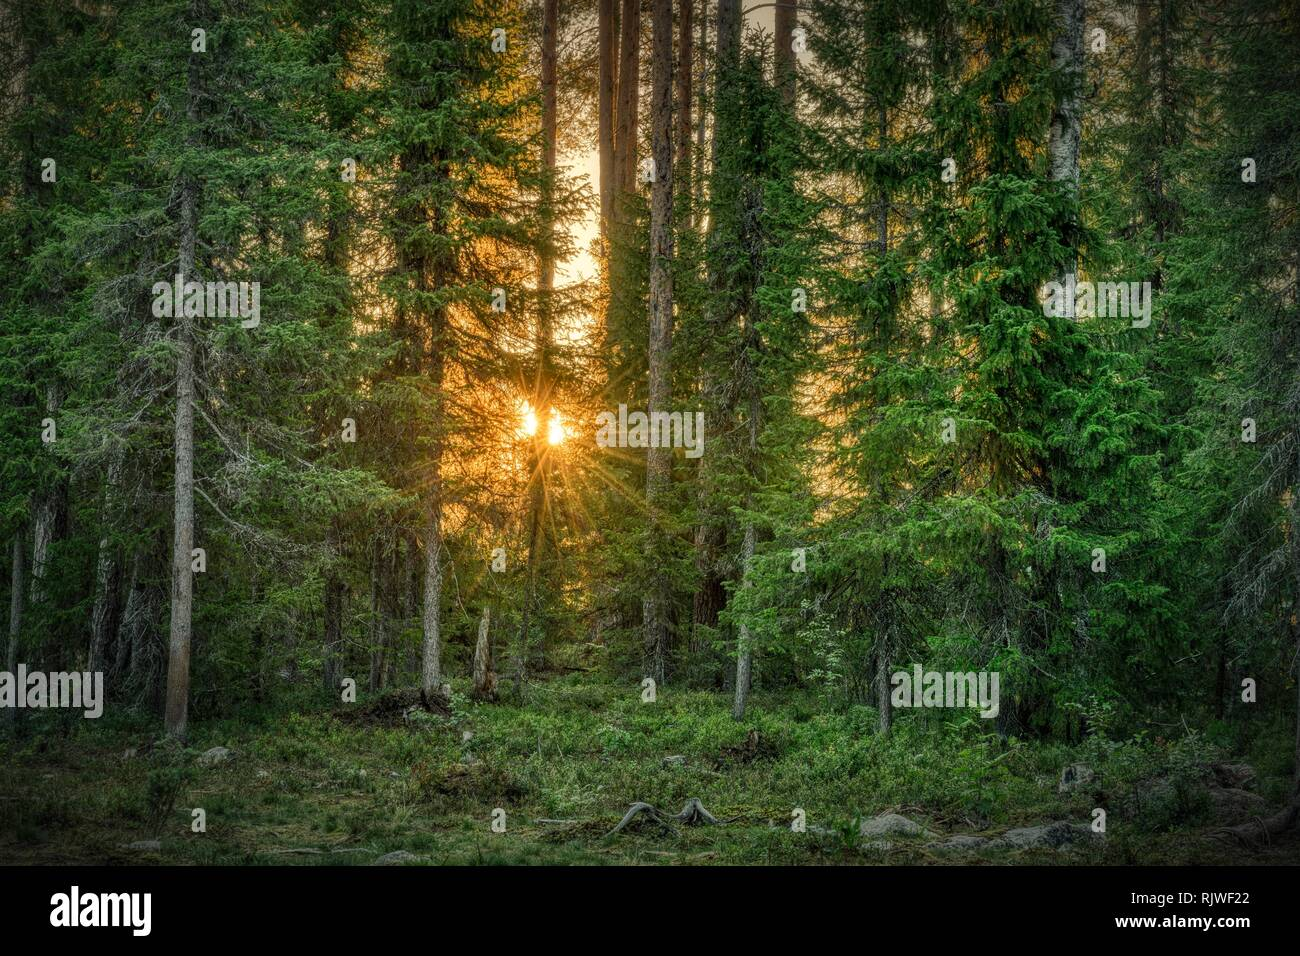 Sun star shining through trees, coniferous forest, Suomussalmi, Kainuu, Finland - Stock Image